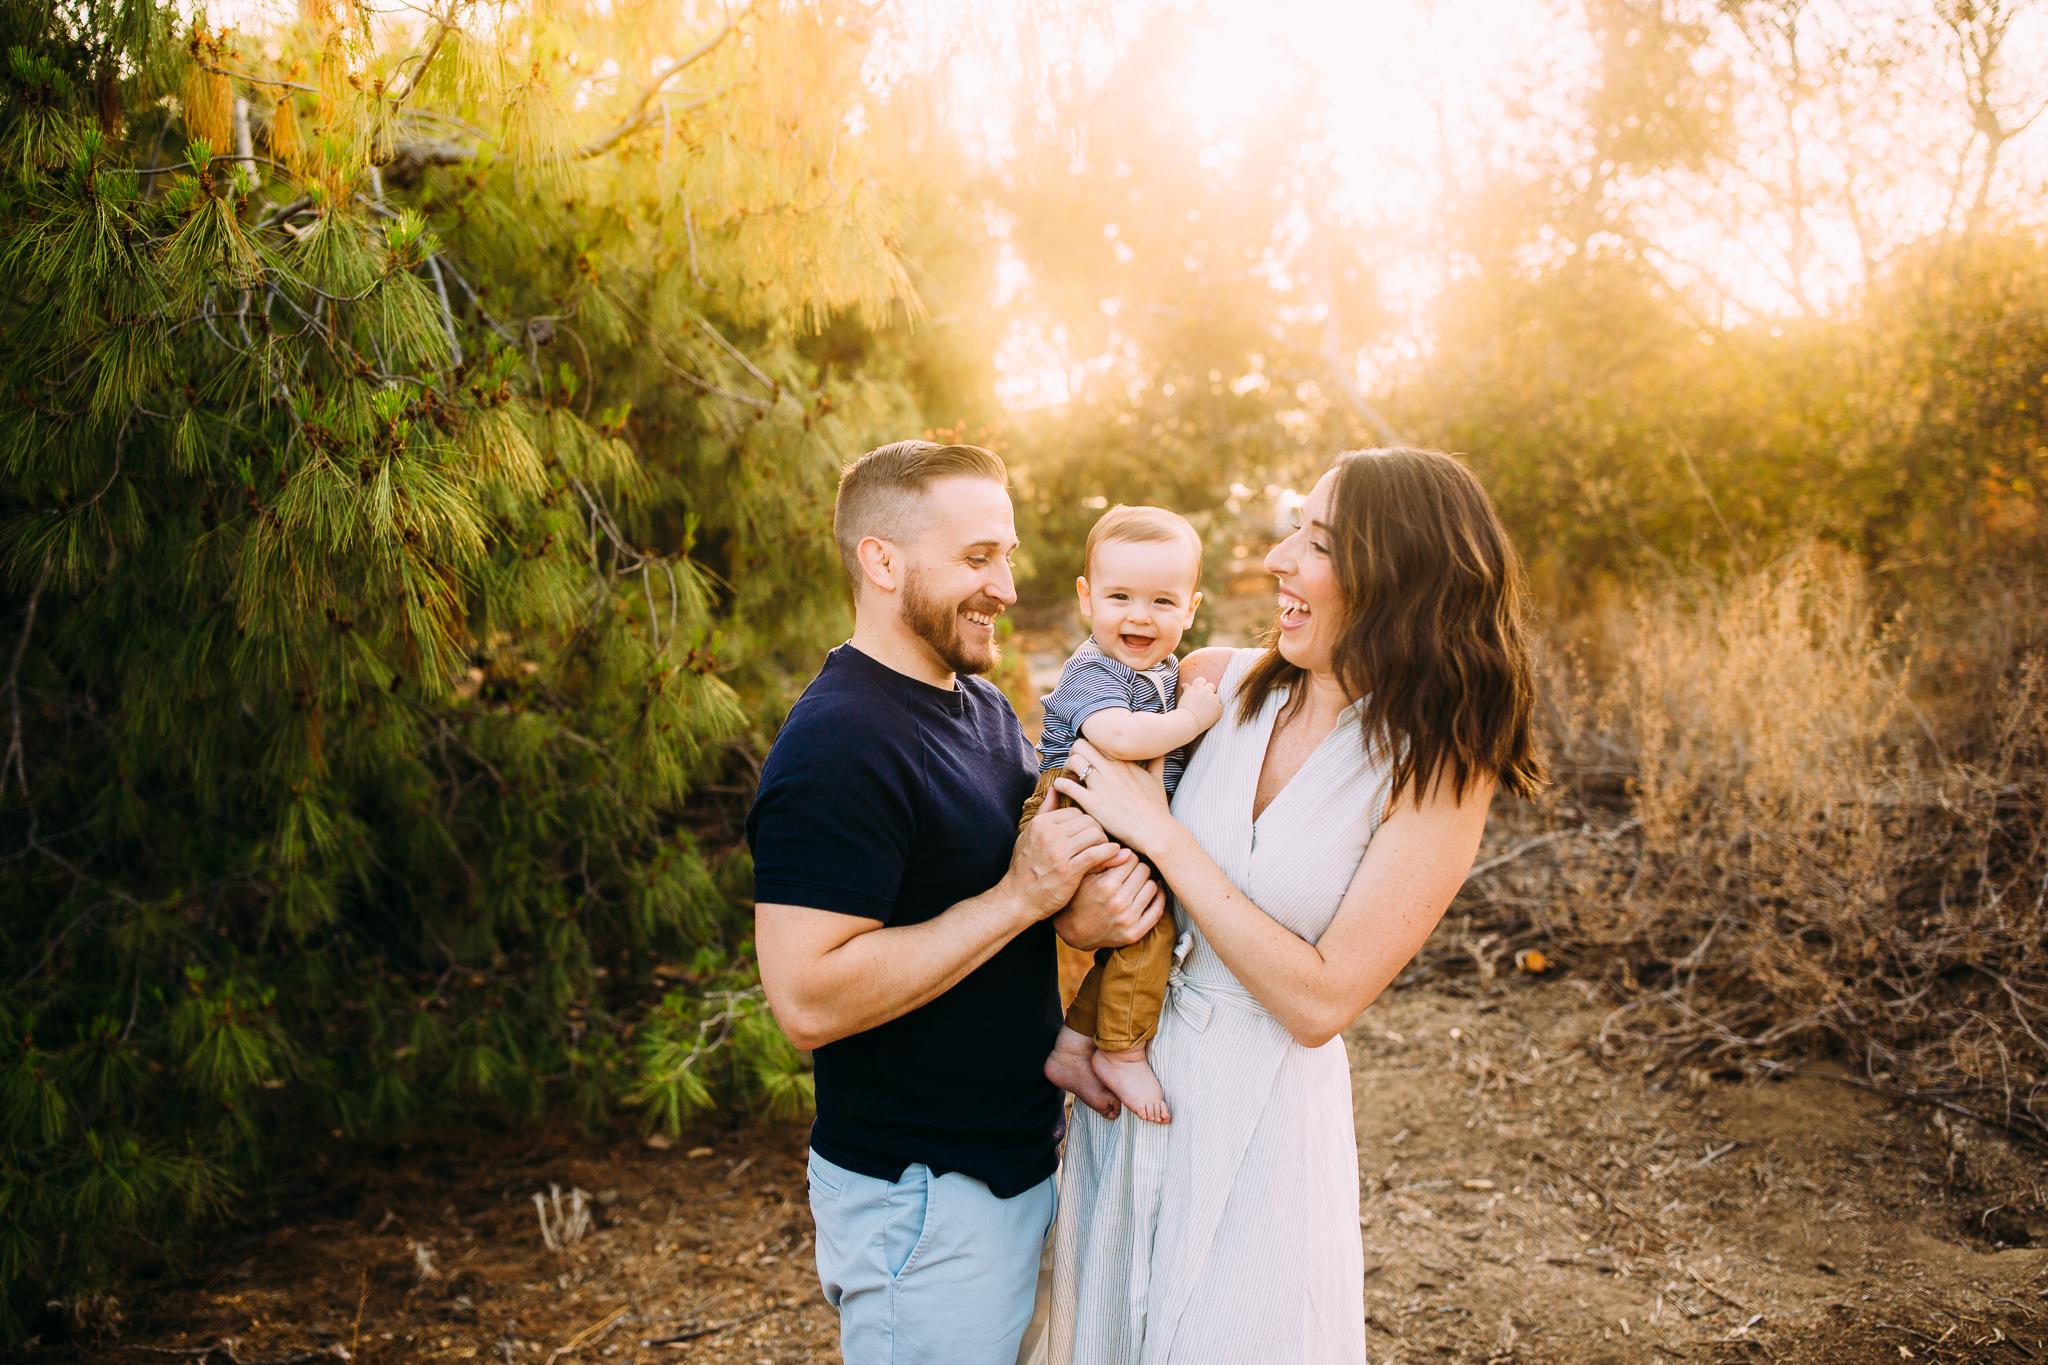 irvinefamilyphotographer-2.jpg